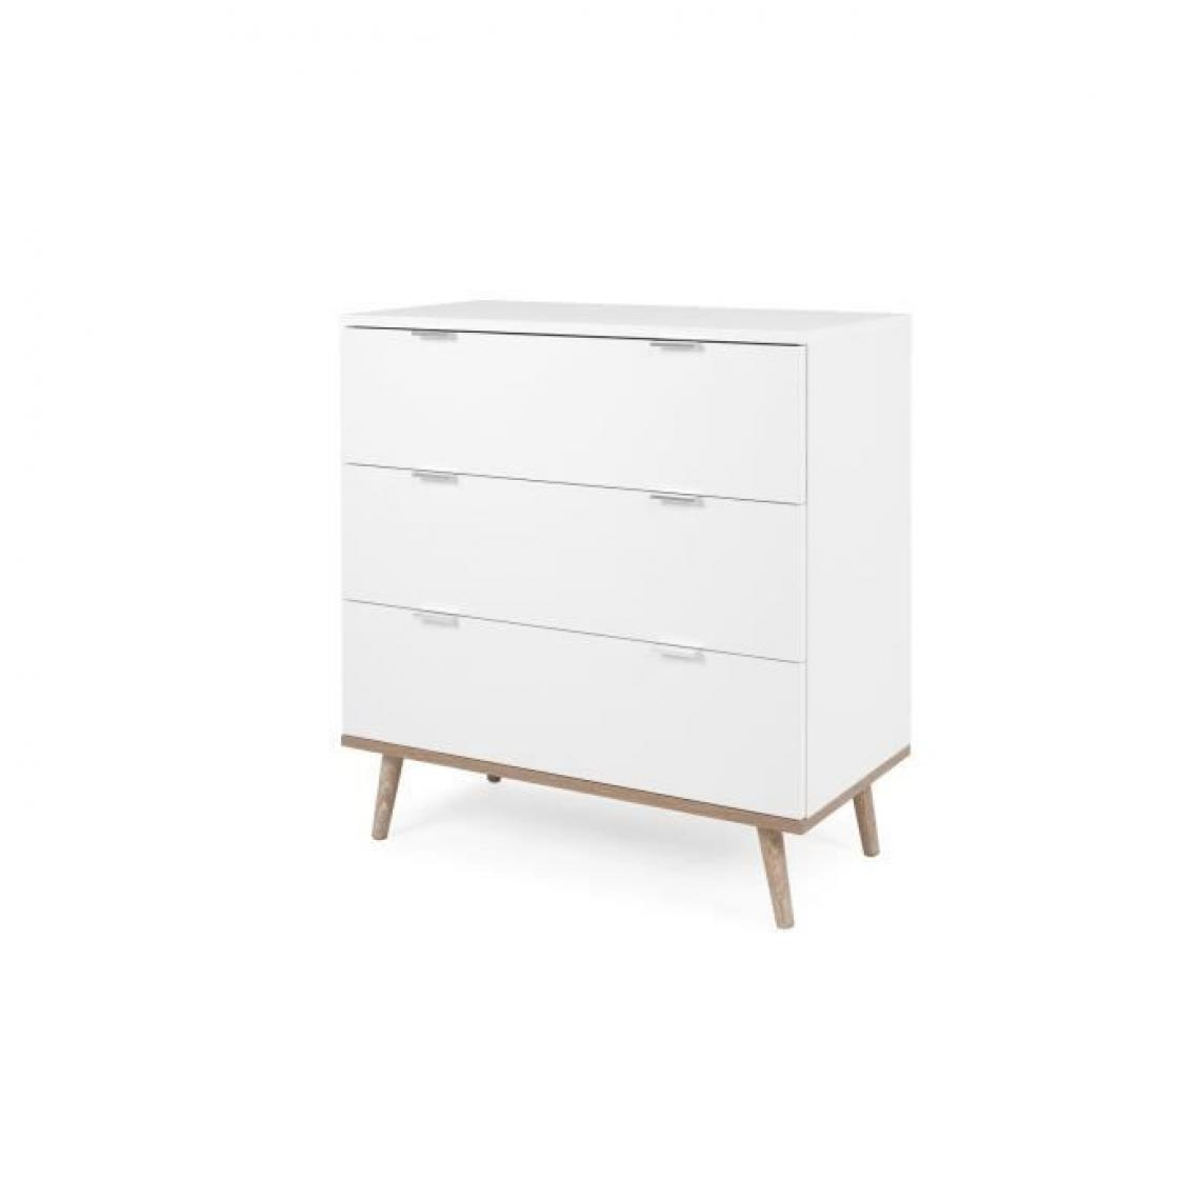 Sans Marque Commode 3 tiroirs - Decor chene sonoma Blanc - L 79,8 x P 40 x H 86,5 cm - GOTEBORG